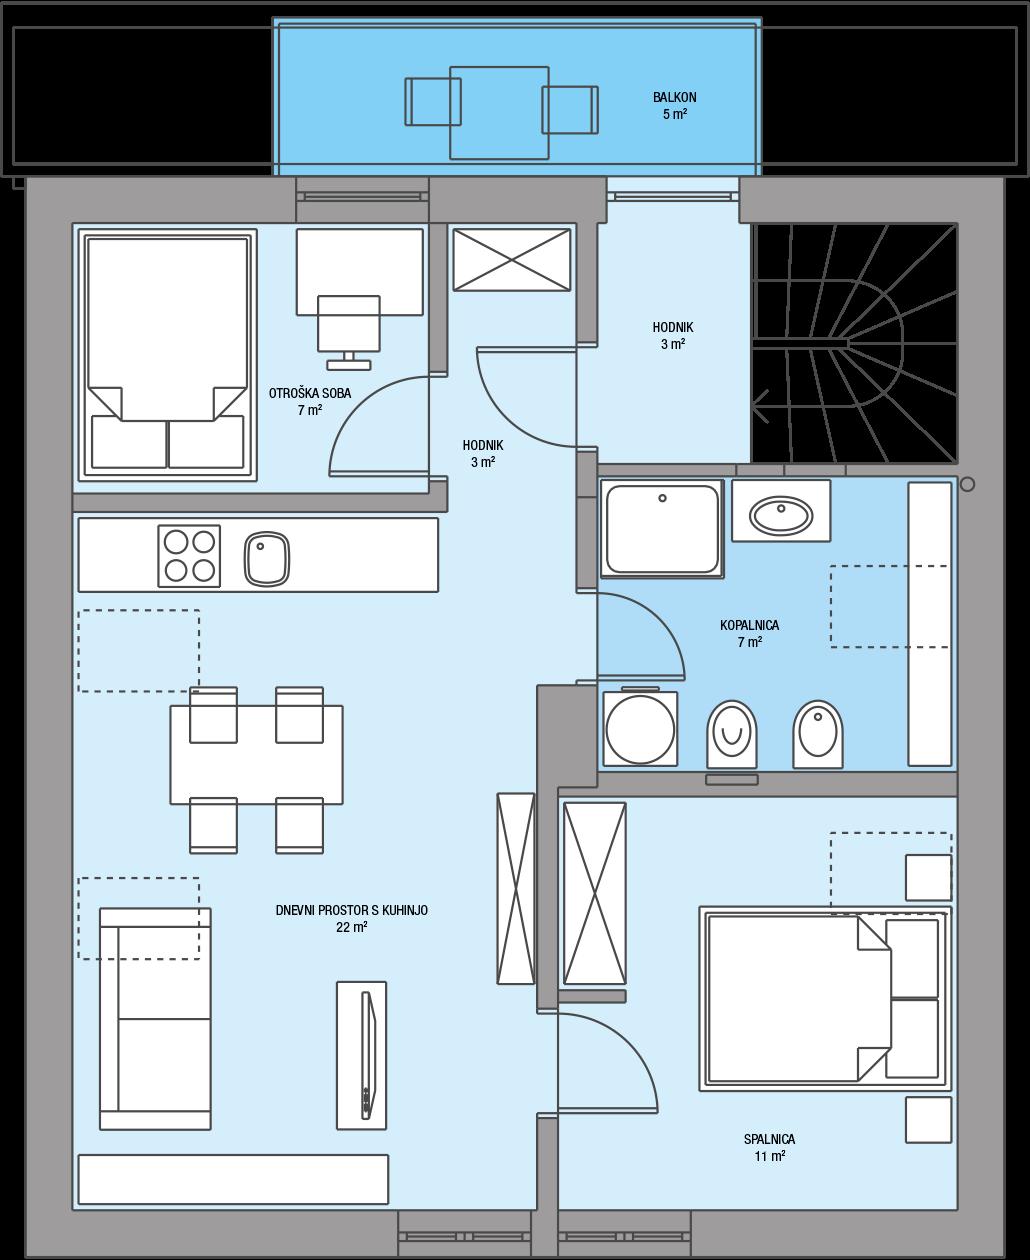 Stanovanjska hiša Domžale – Tloris mansarda